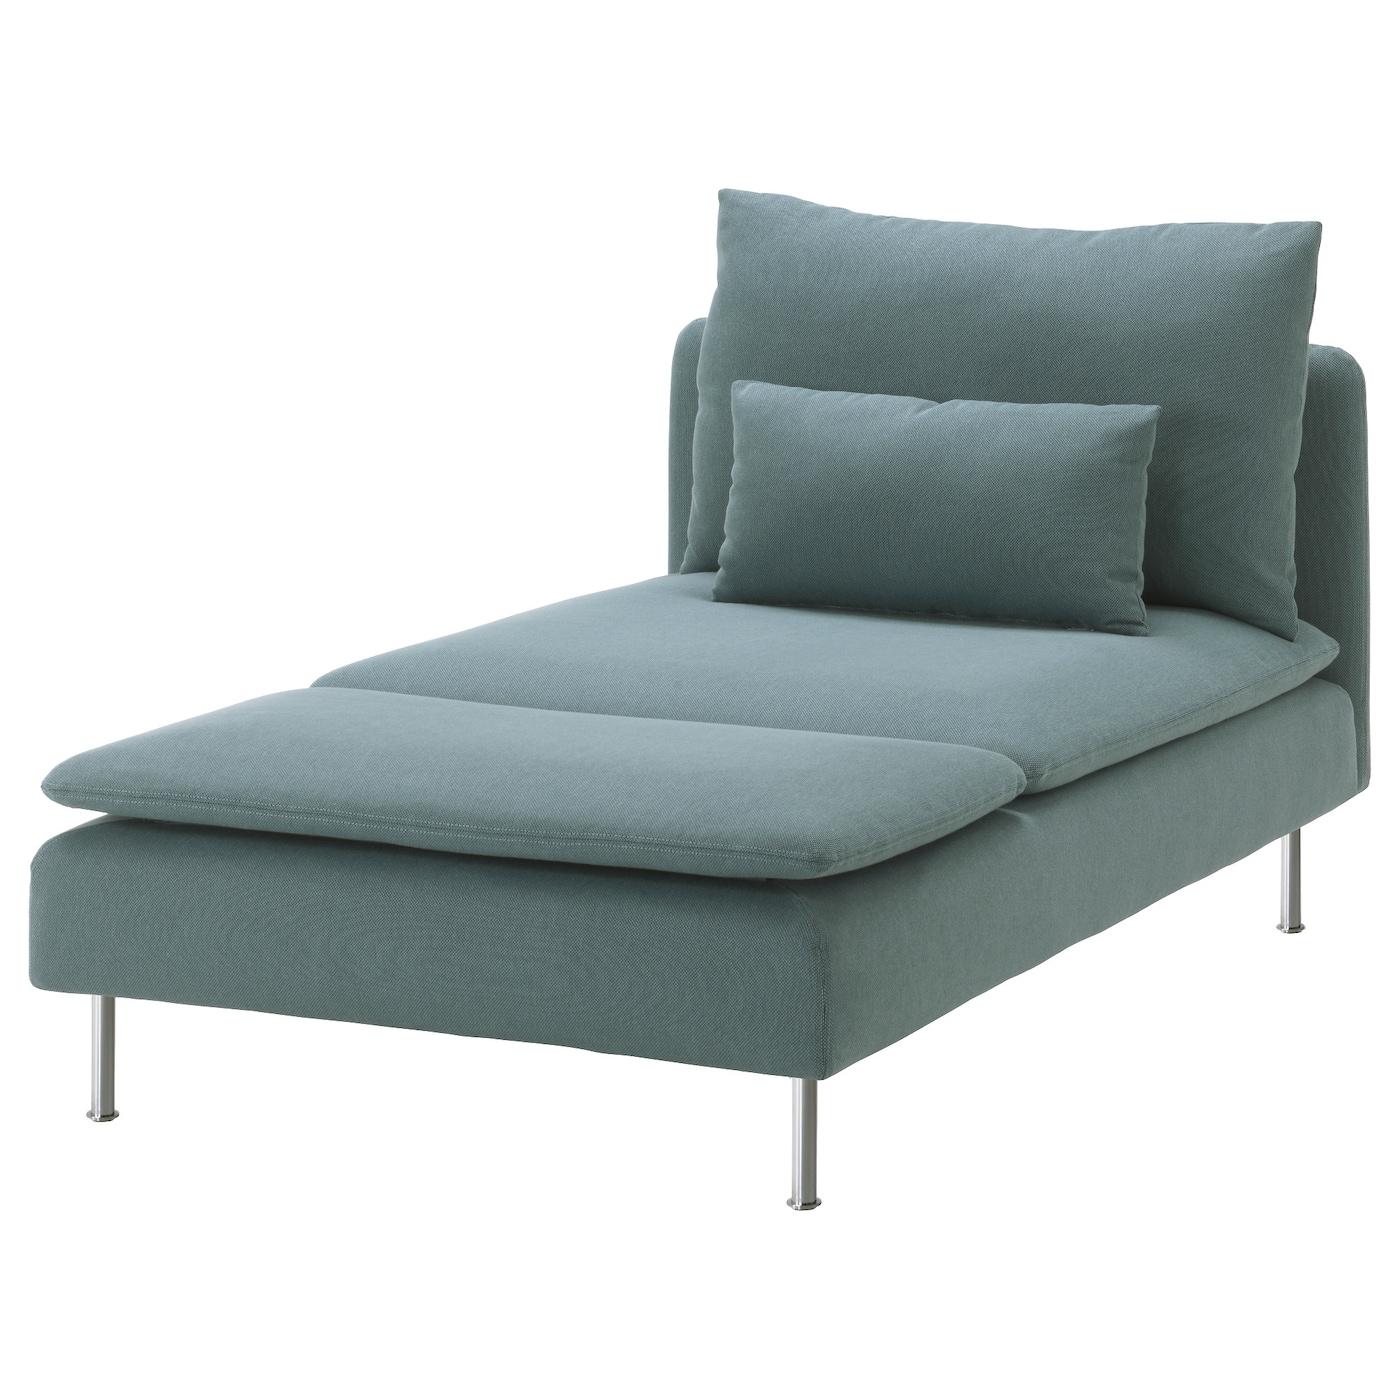 Véritable IKEA soderhamn Accoudoir Housse-finnsta Turquoise 003.283.33 NEUF